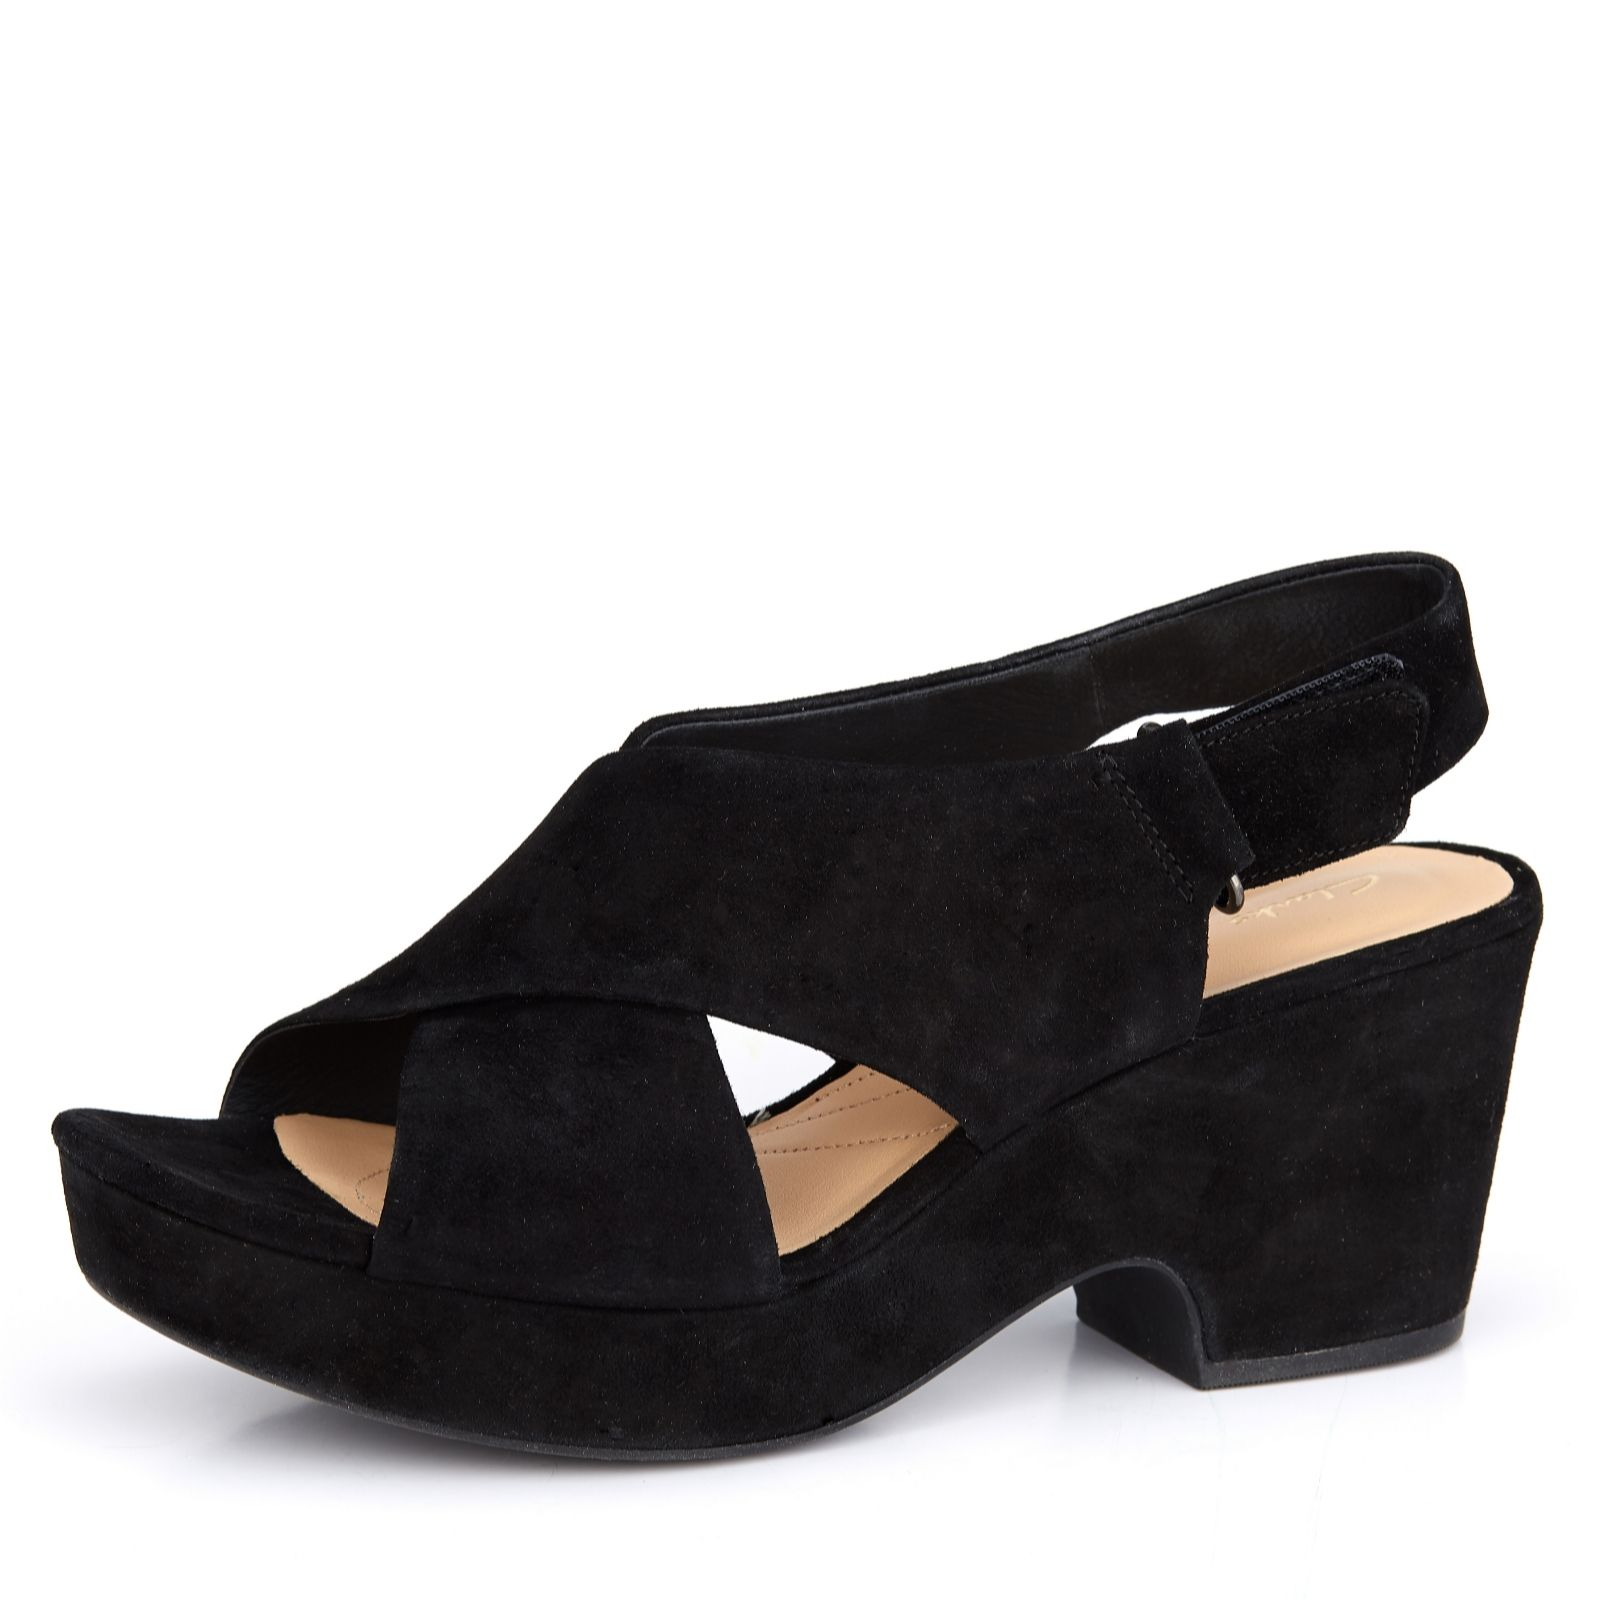 658ea7097a5 Clarks Marista Lara Cross Strap Sandal Standard Fit - QVC UK